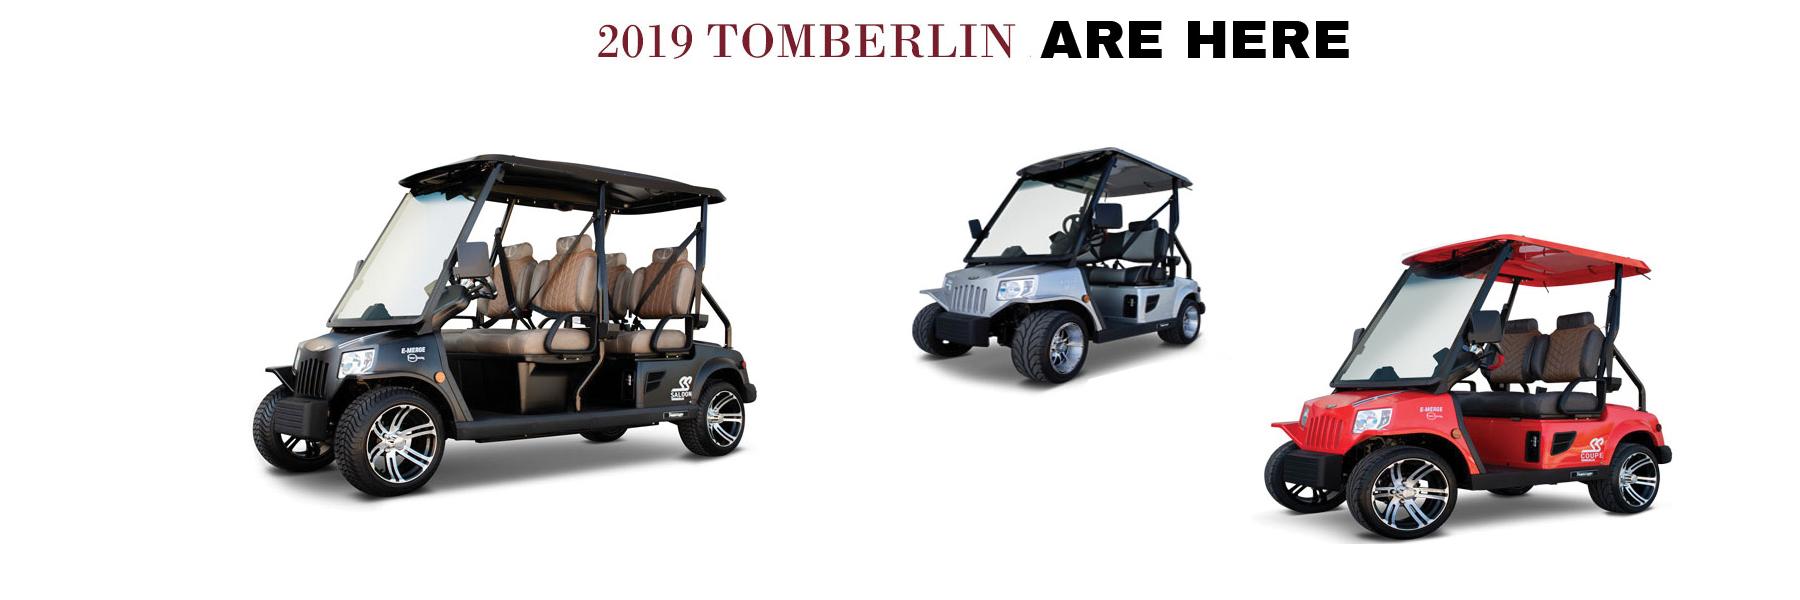 Tomberlin Emerge E2 Wiring Diagram Helix Go Kart 150cc Charging E On Crossfire